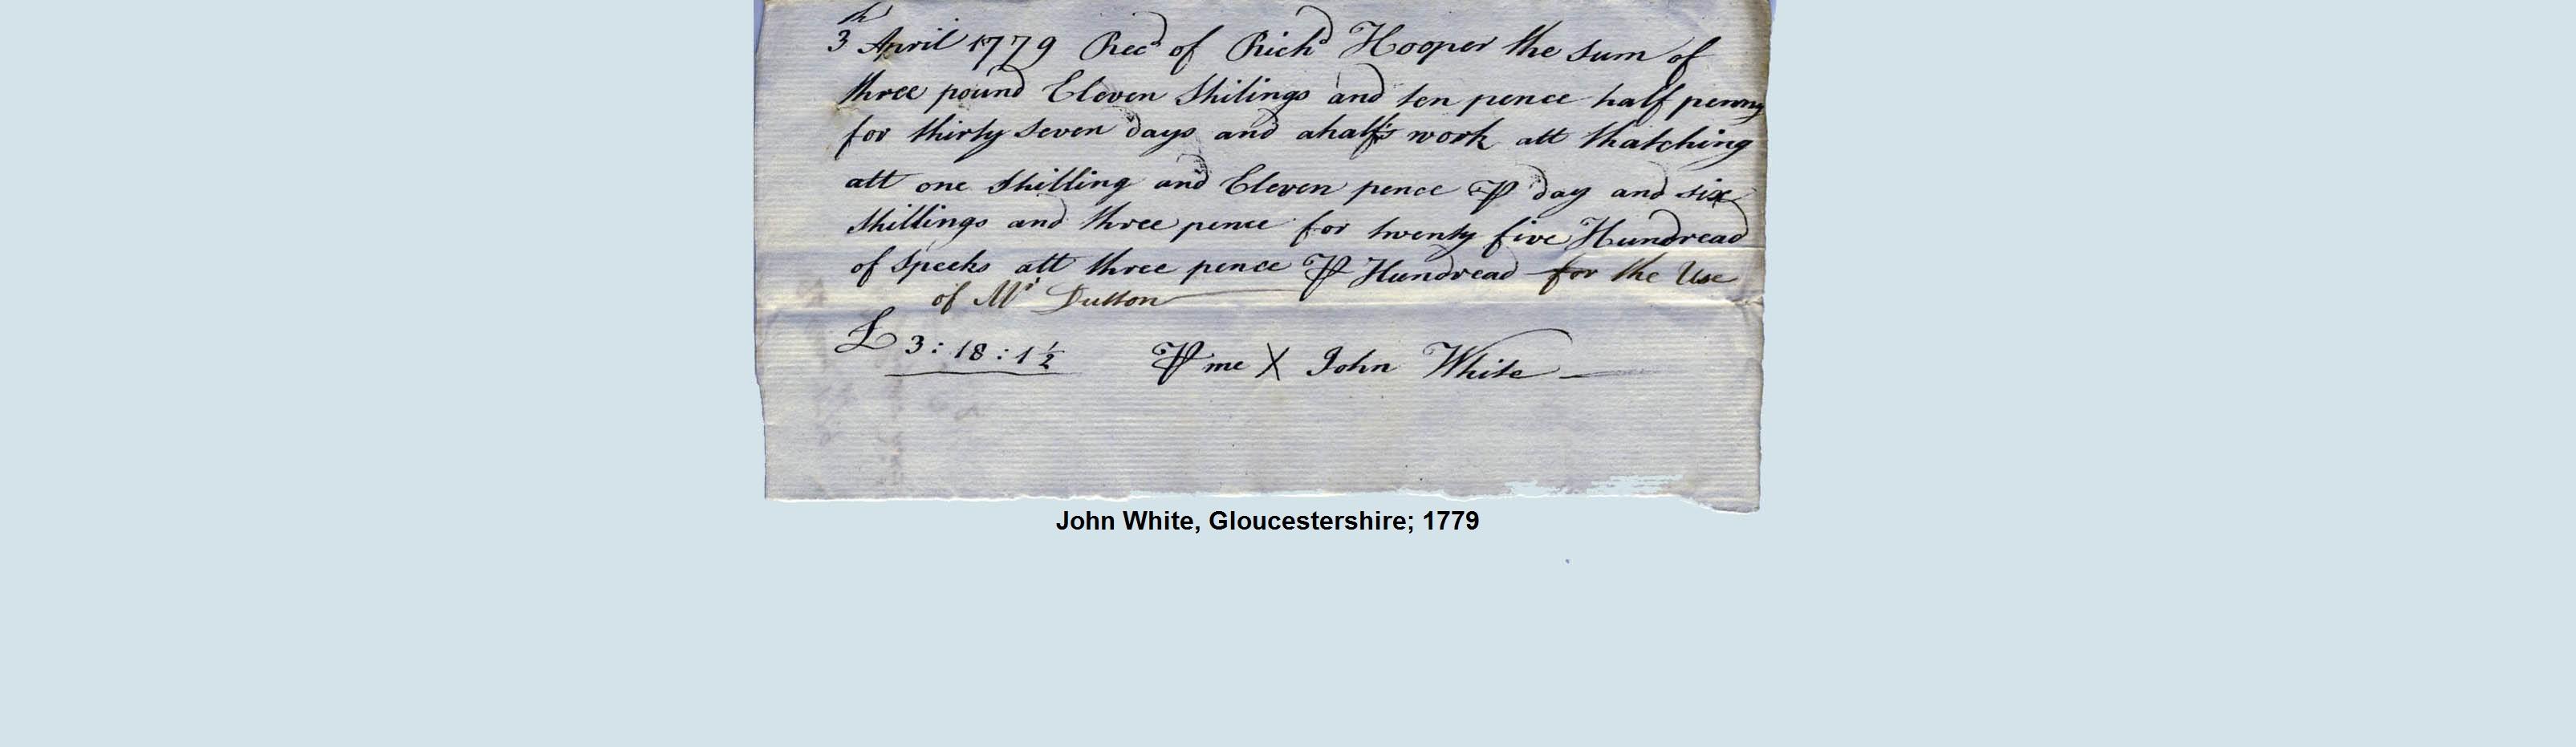 thatch bill 1796